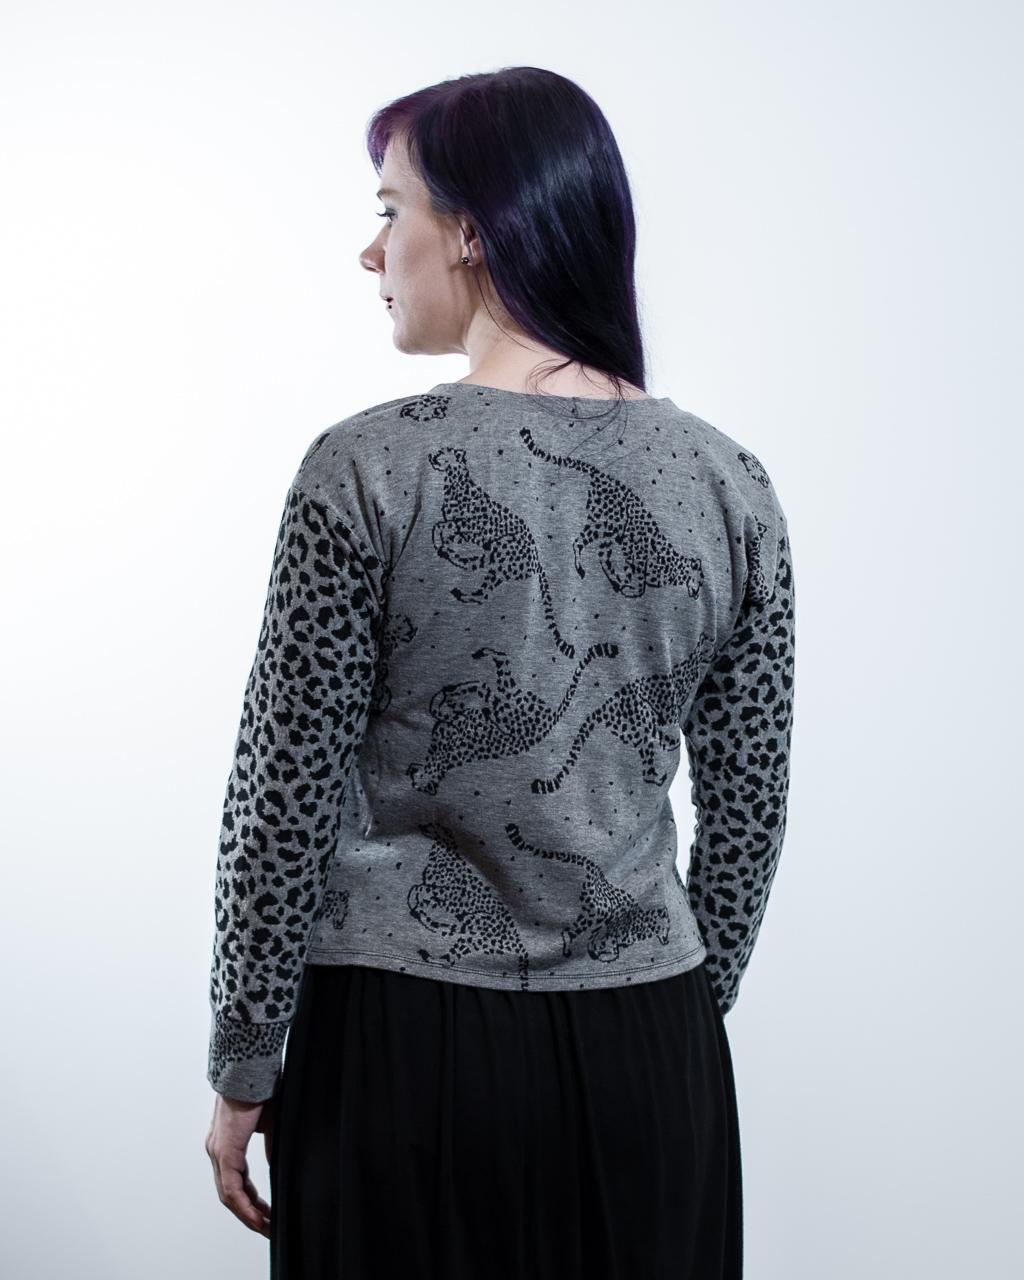 cheetah fabric sweatshirt selfdrafted modified sewing pattern Minn's Things no yolk back view